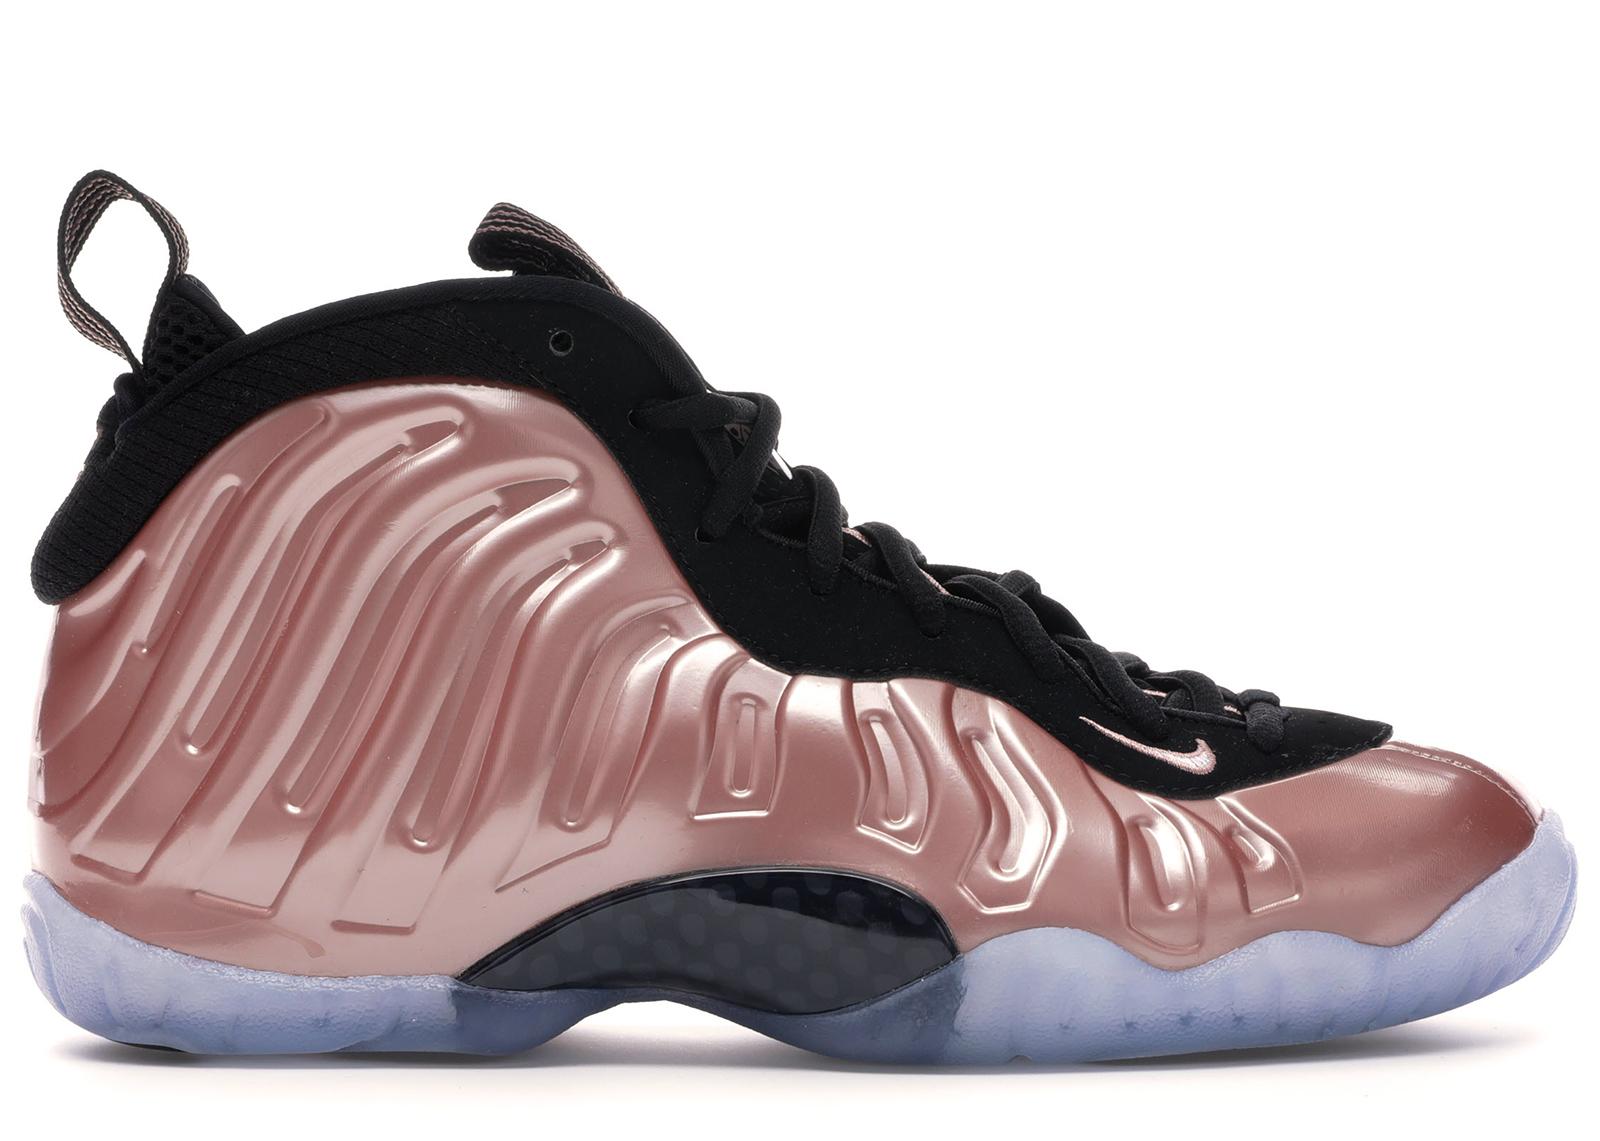 Nike Air Foamposite One Rust Pink (GS